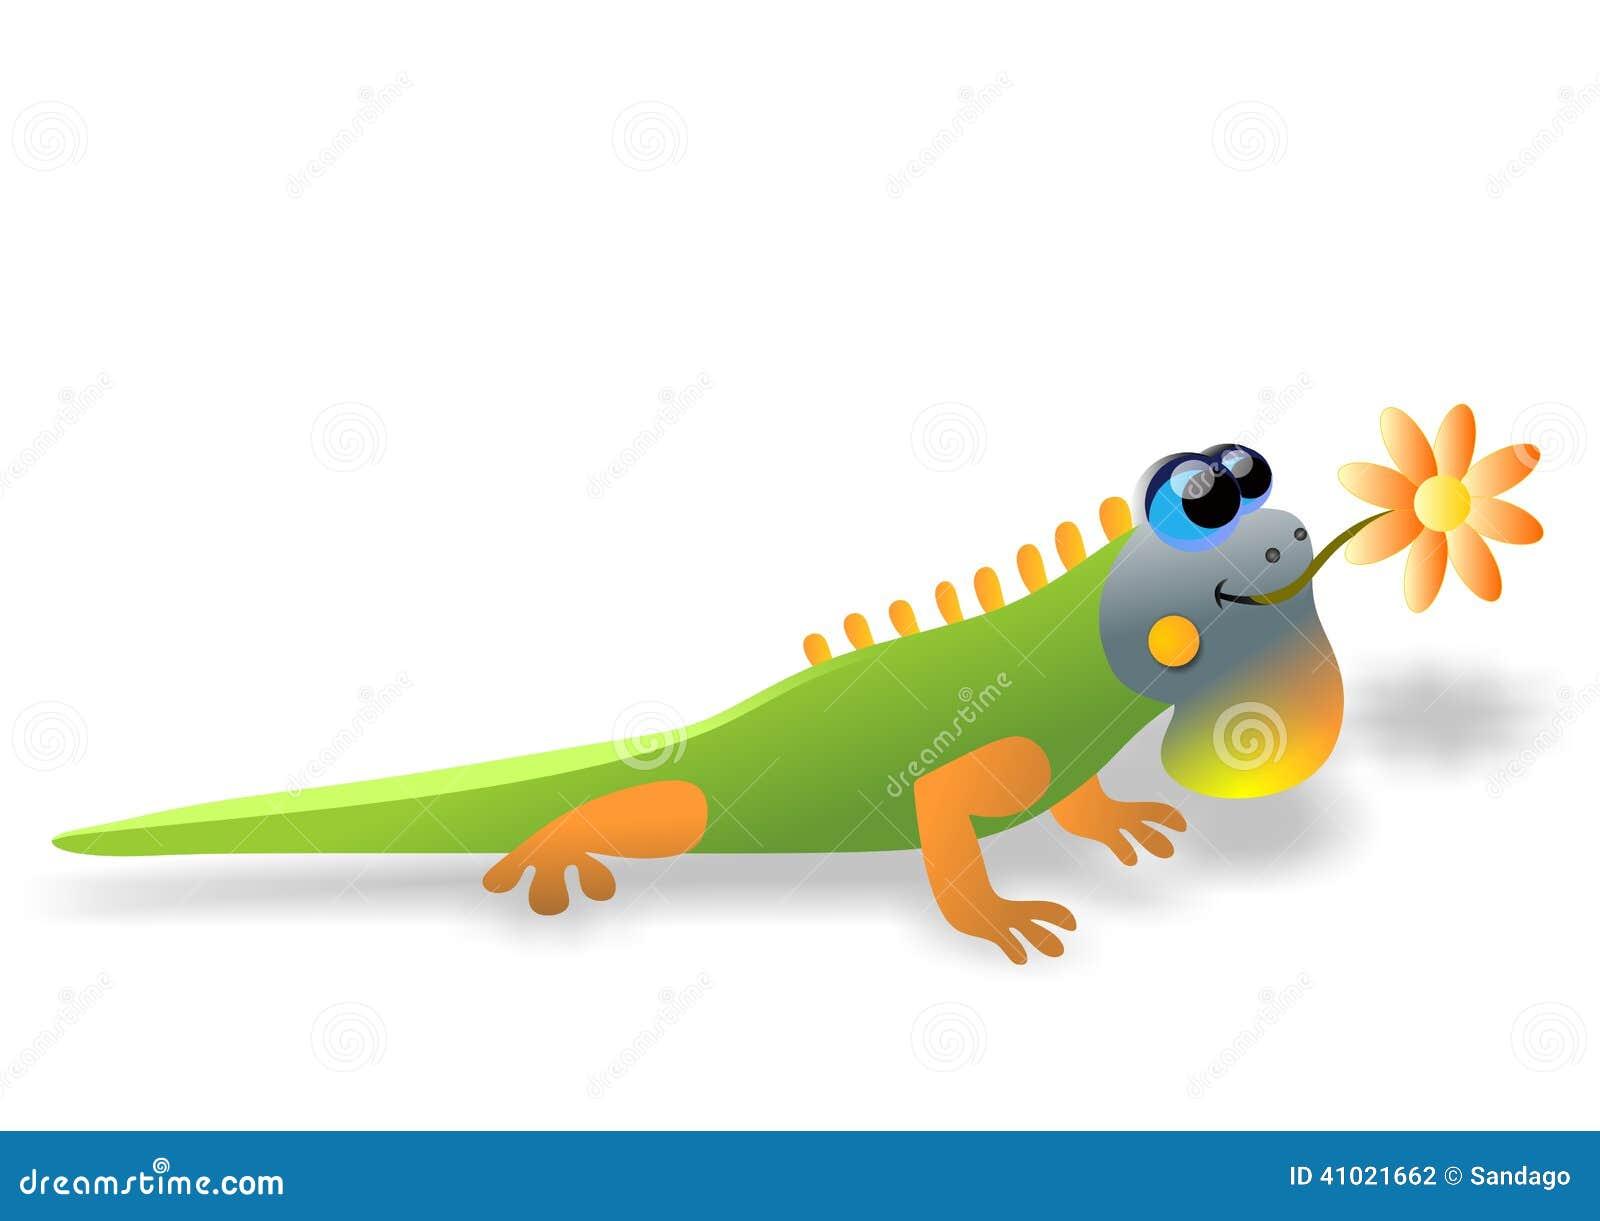 Iguana Cartoon Stock Vector Image 41021662